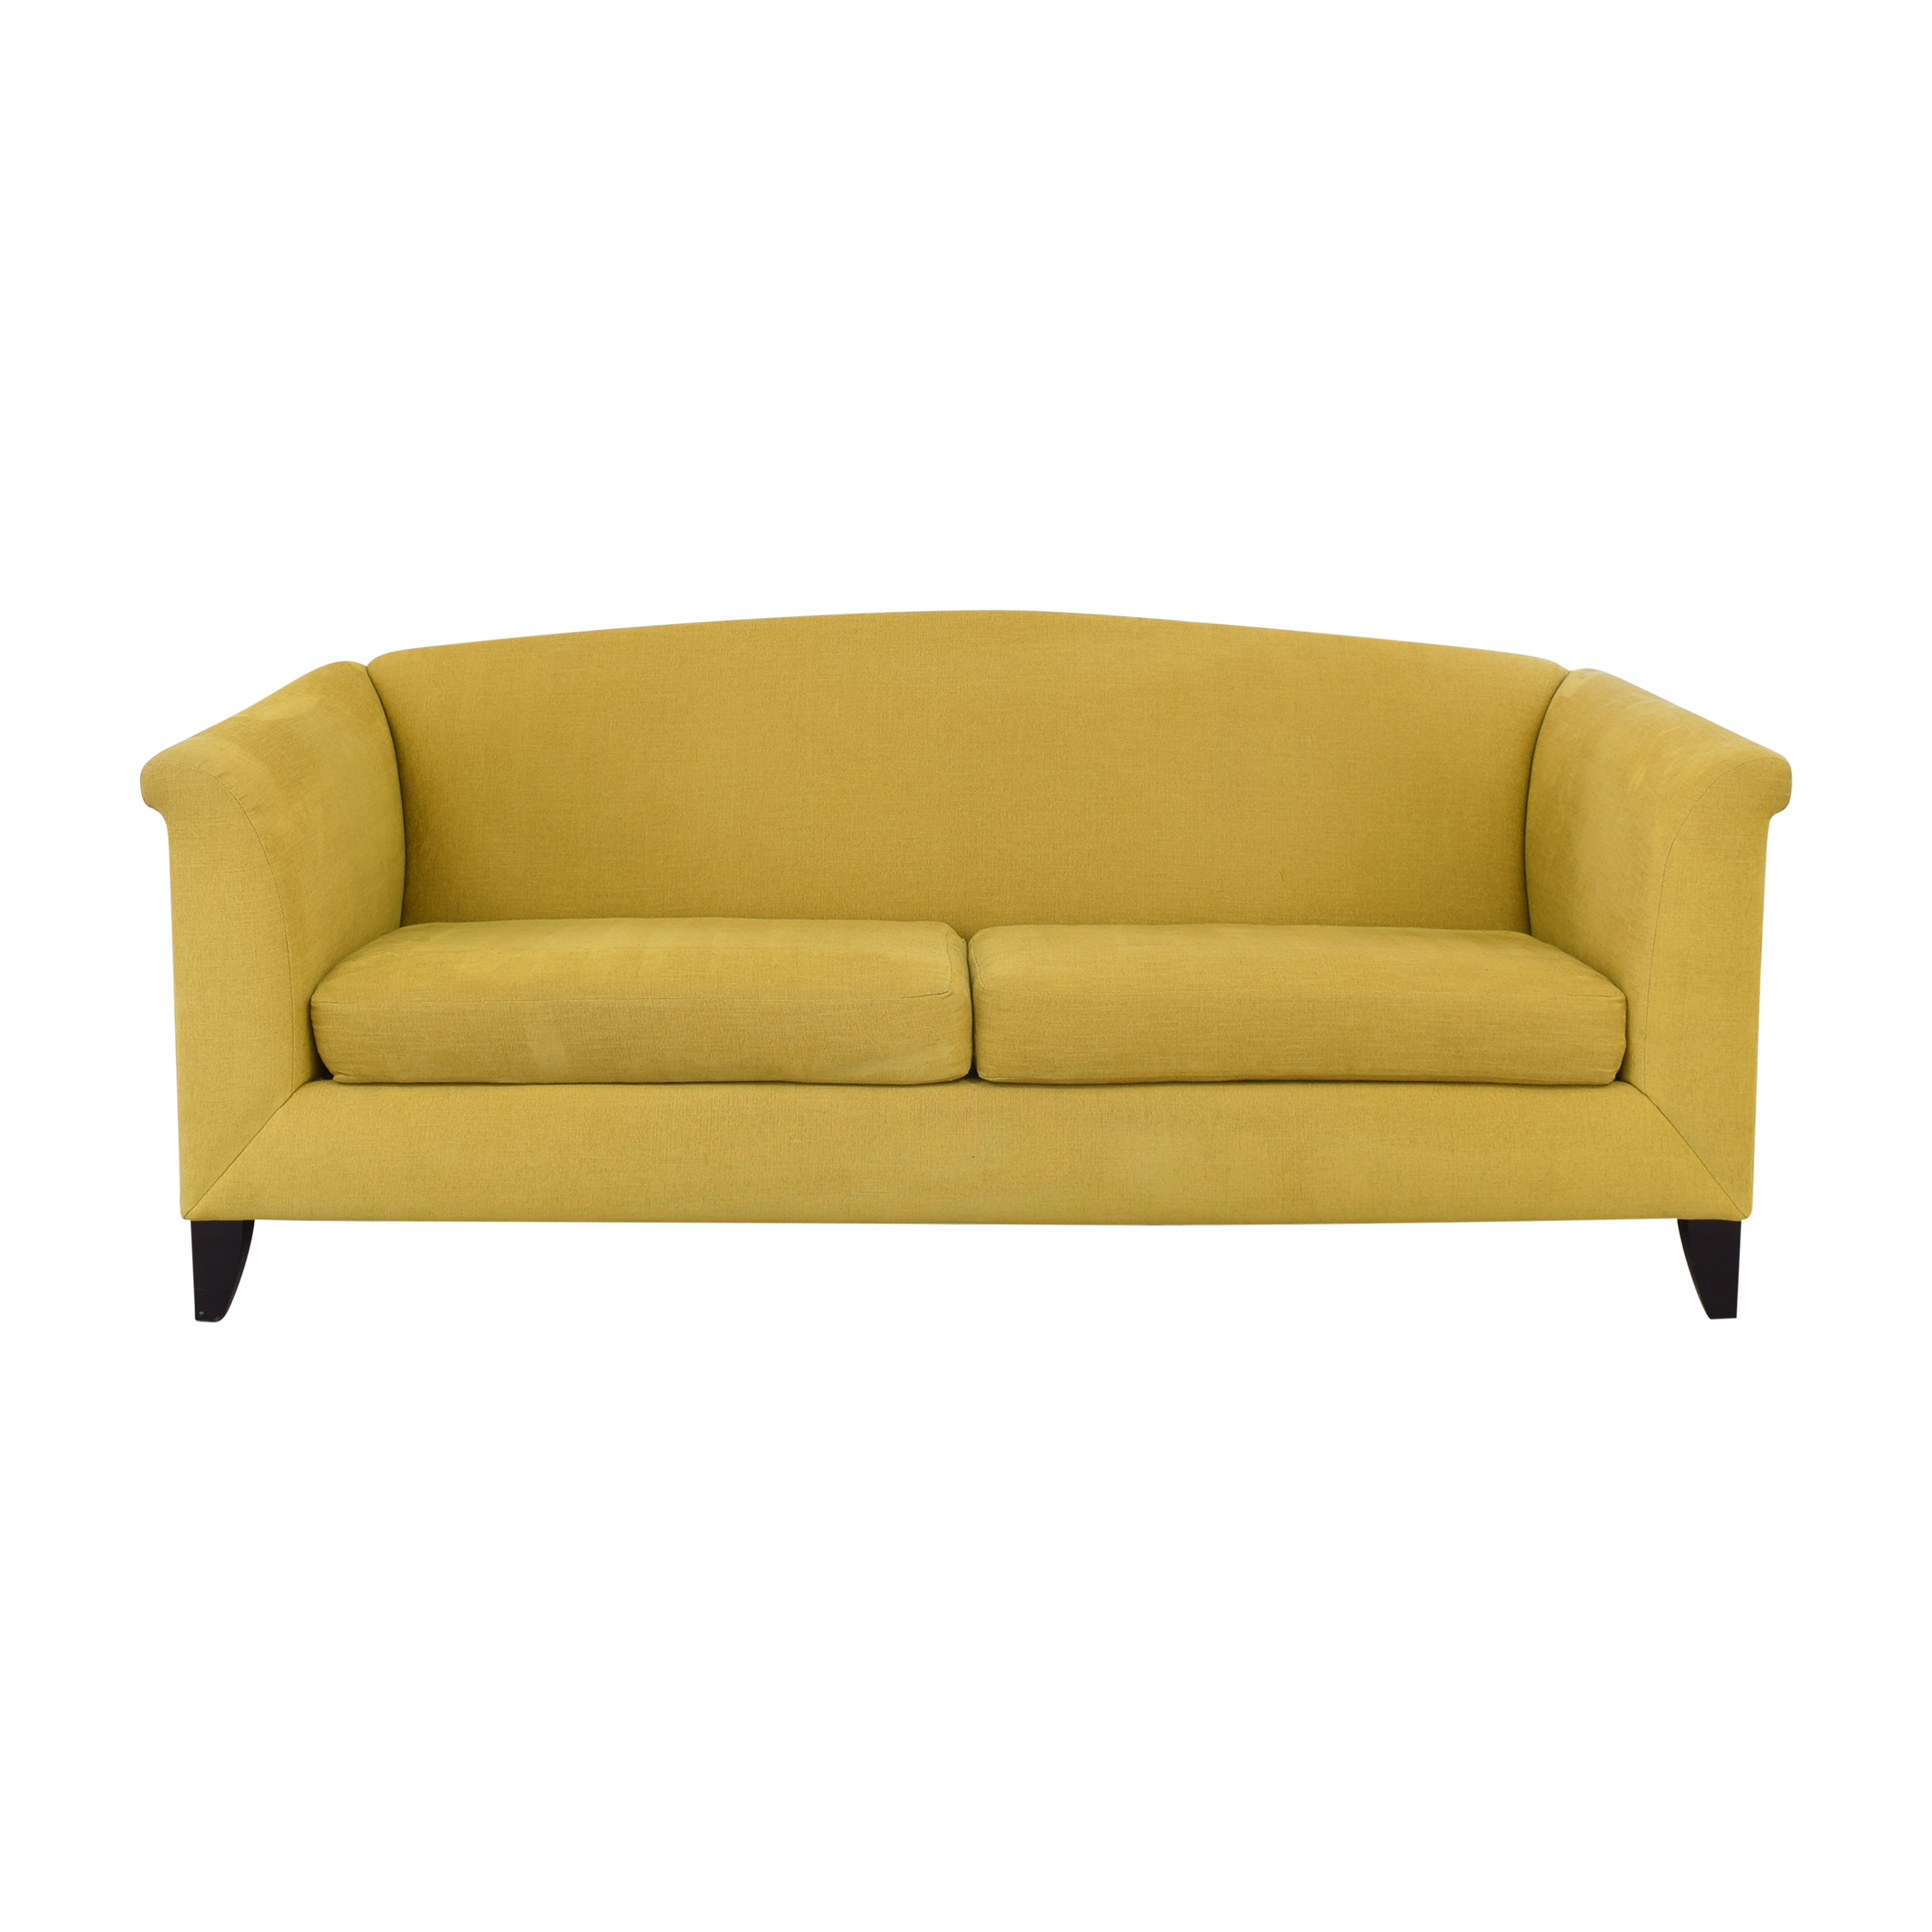 Crate & Barrel Crate & Barrel Silhouette Sofa ct